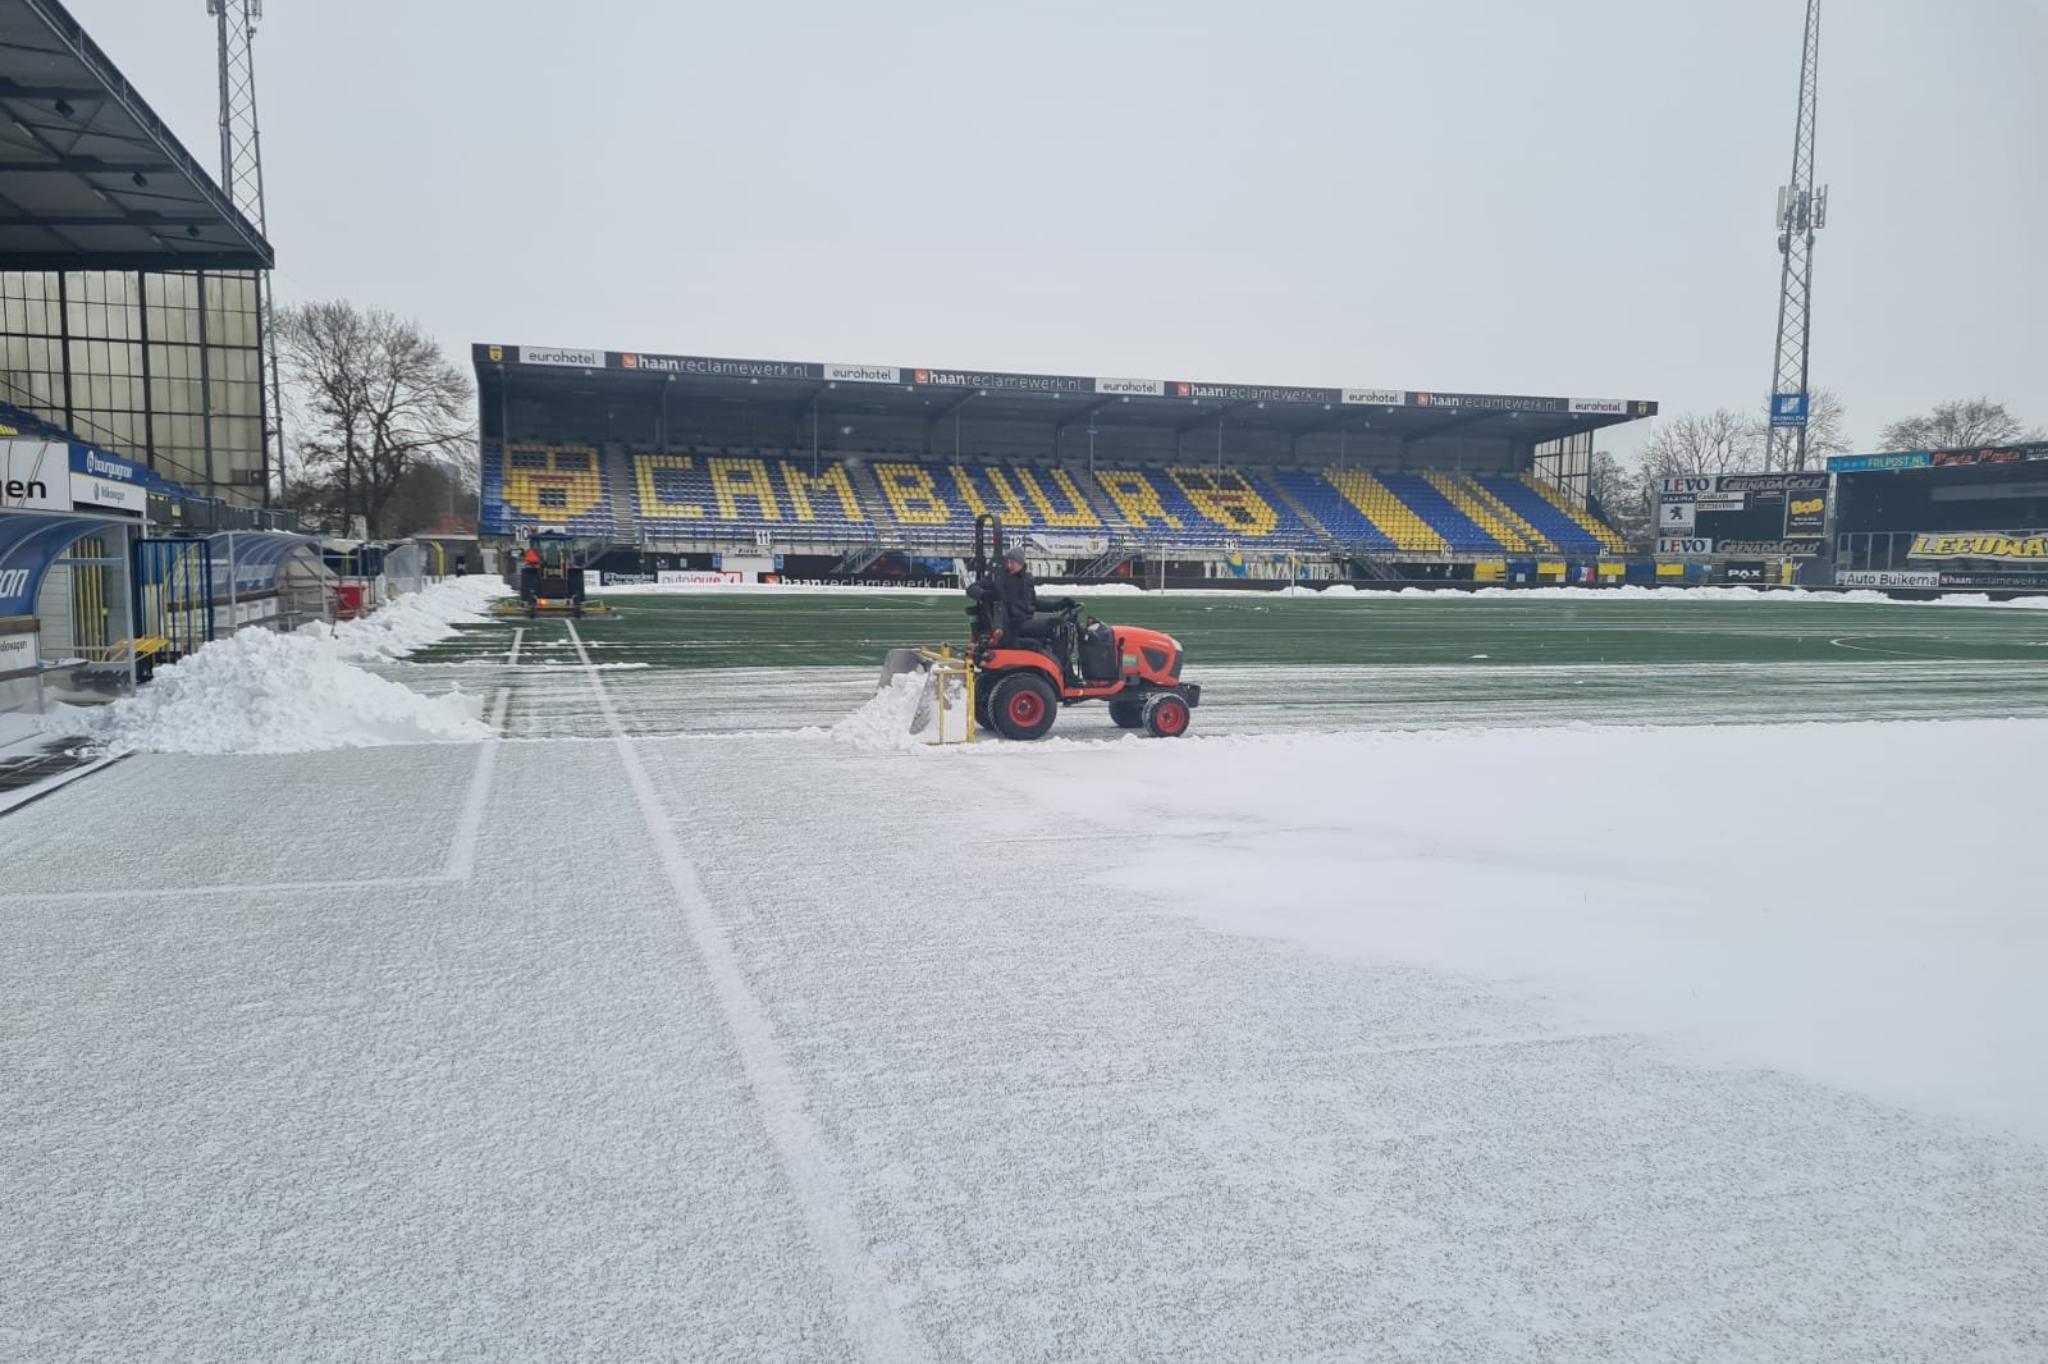 Cambuur Stadion (SC Cambuur)